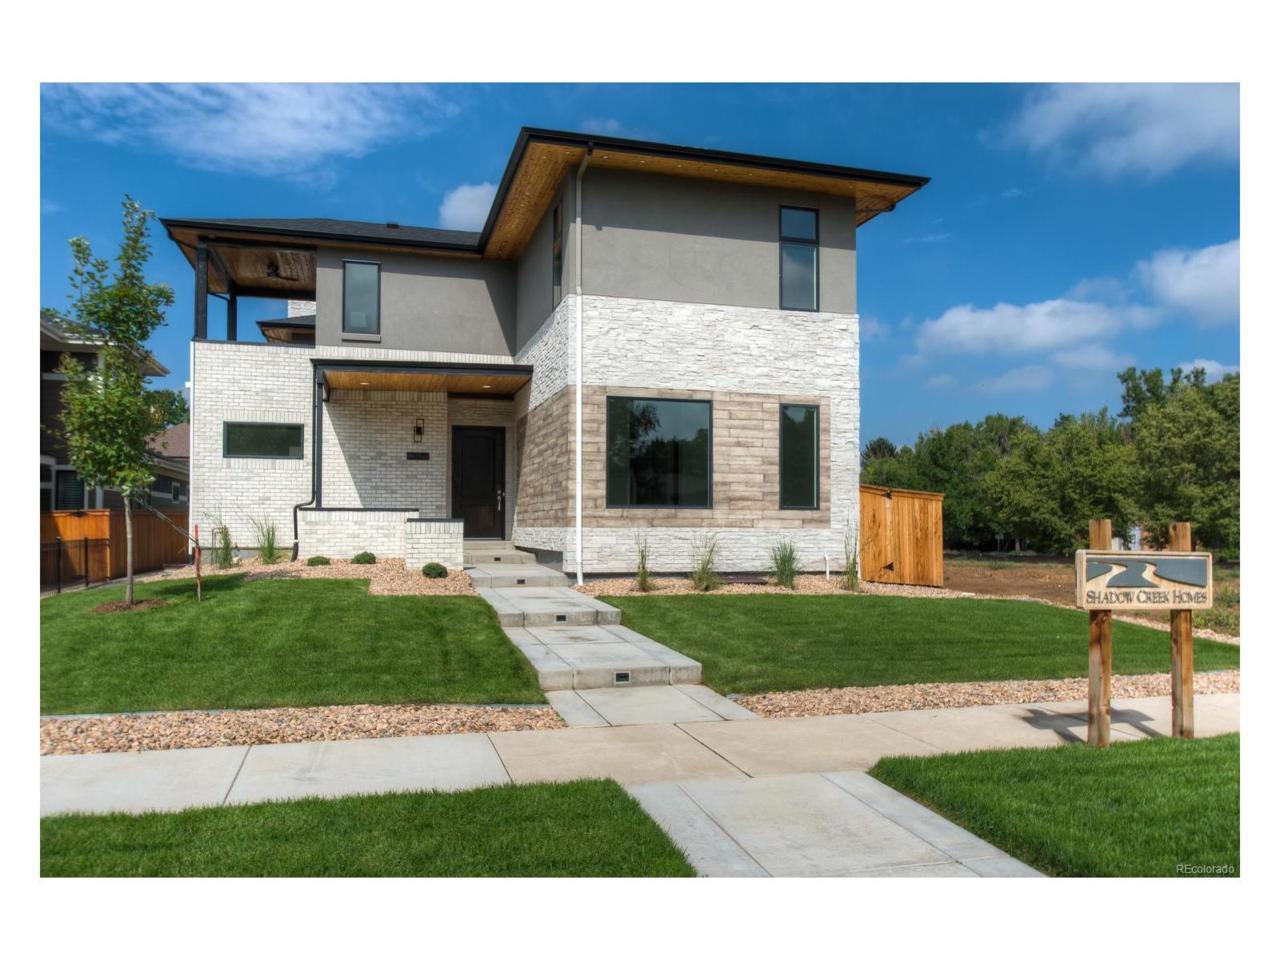 2113 S Madison Street, Denver, CO 80210 (MLS #8499688) :: 8z Real Estate